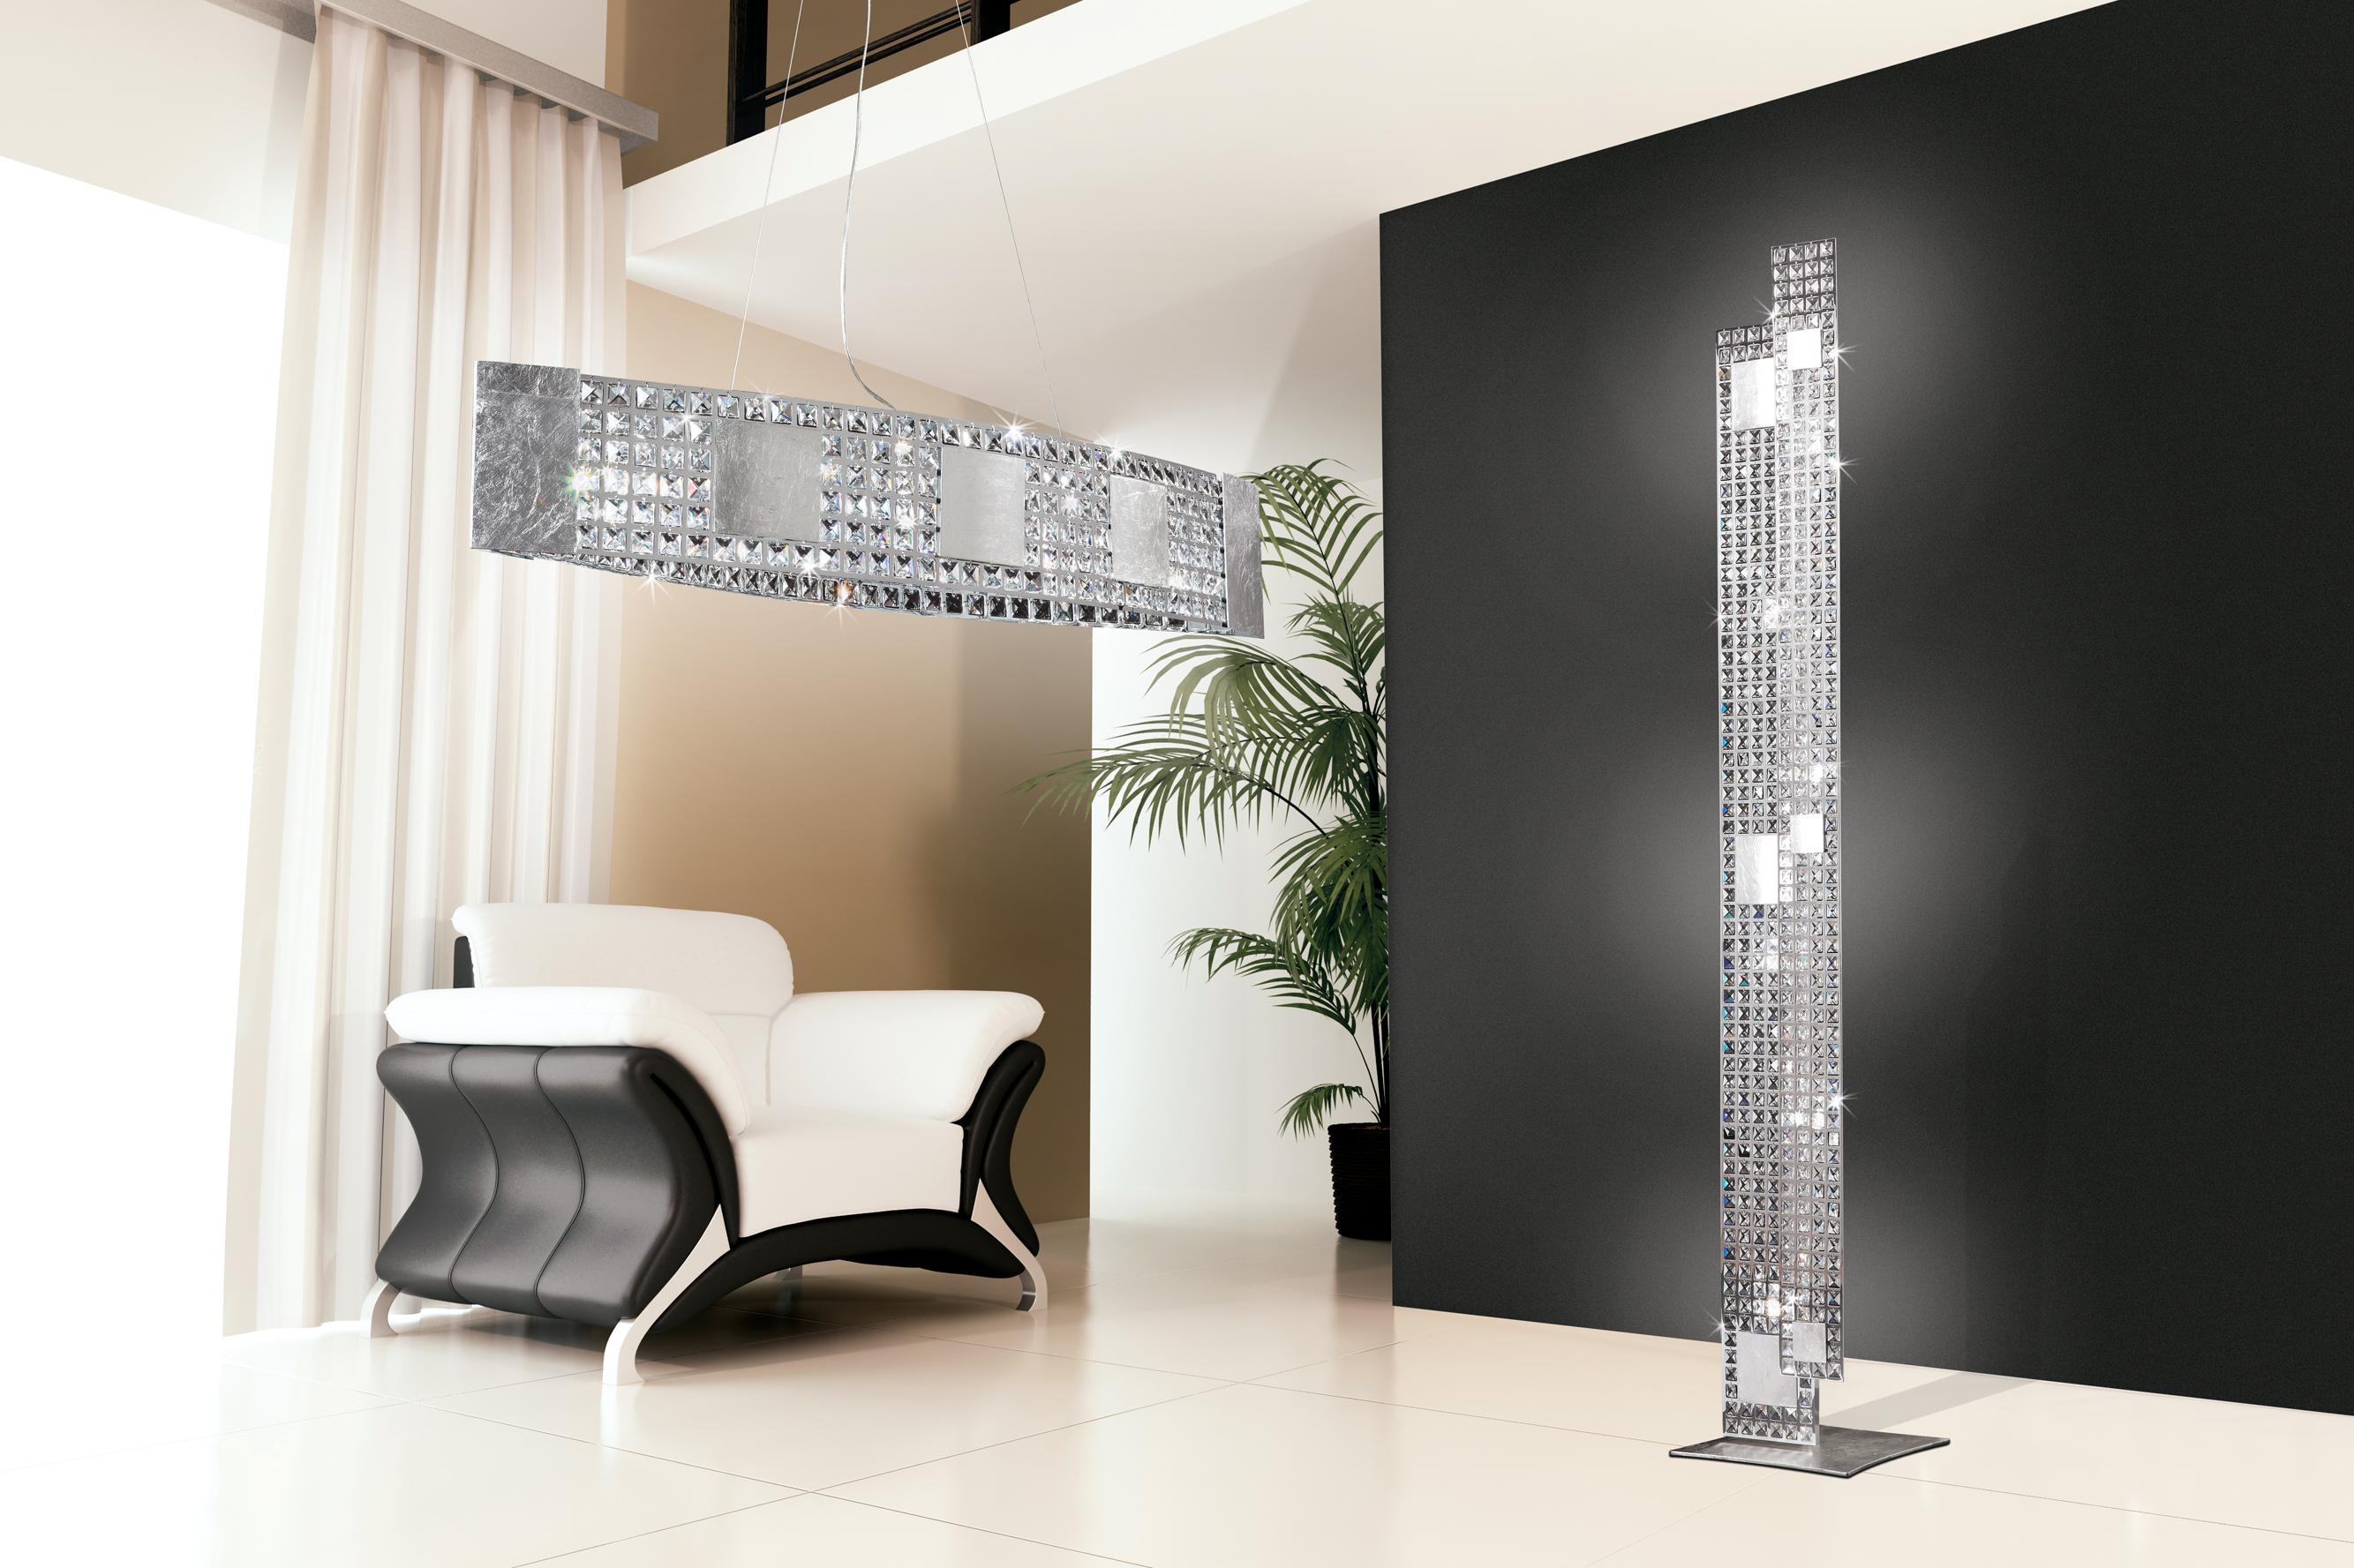 Lampadari A Sospensione Applique Moderne E Lampade Di ...